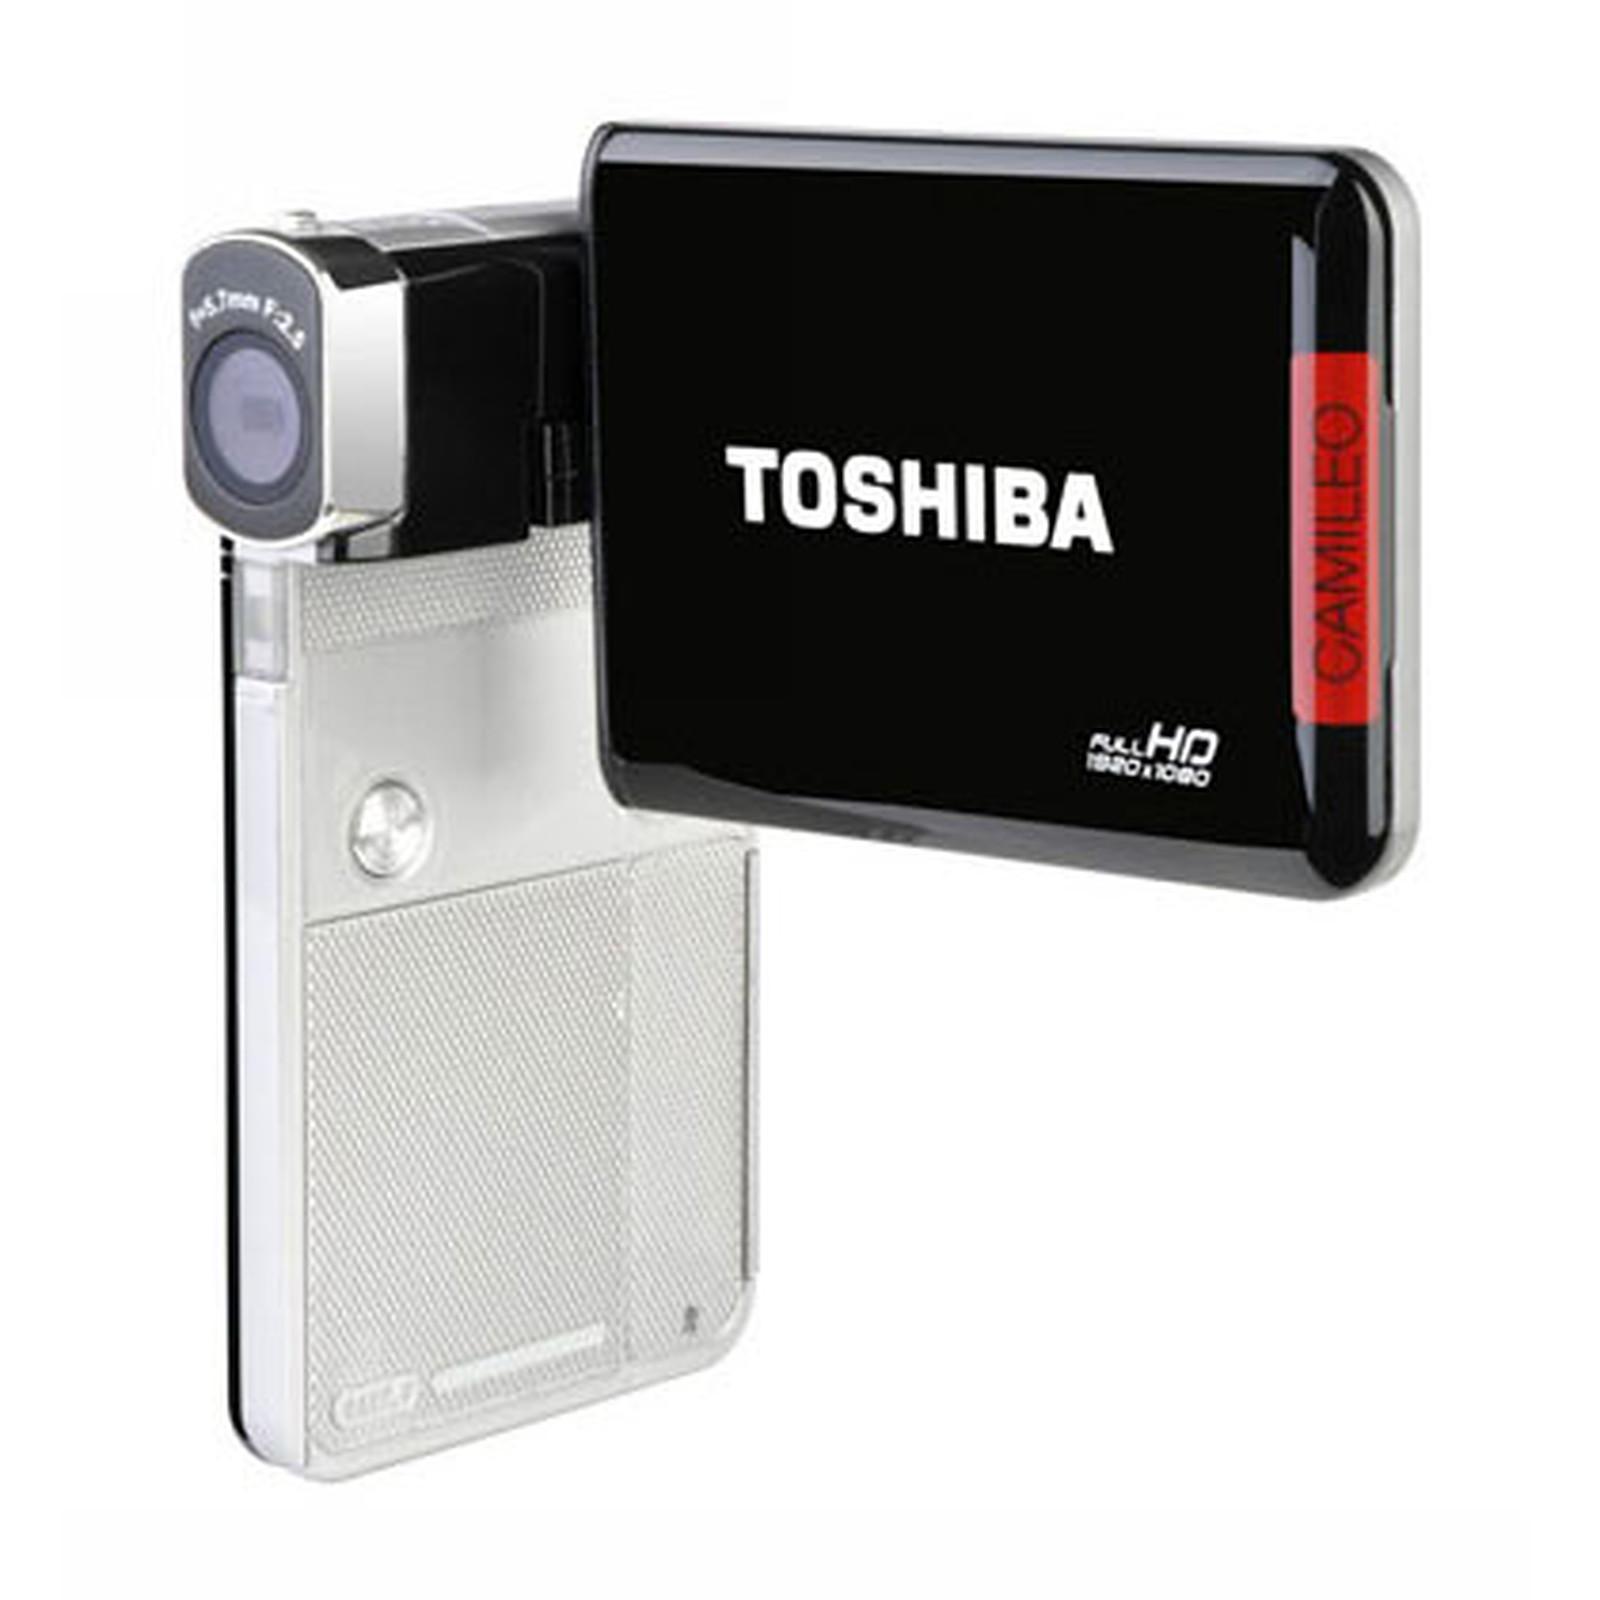 Toshiba Camileo S30 Noir